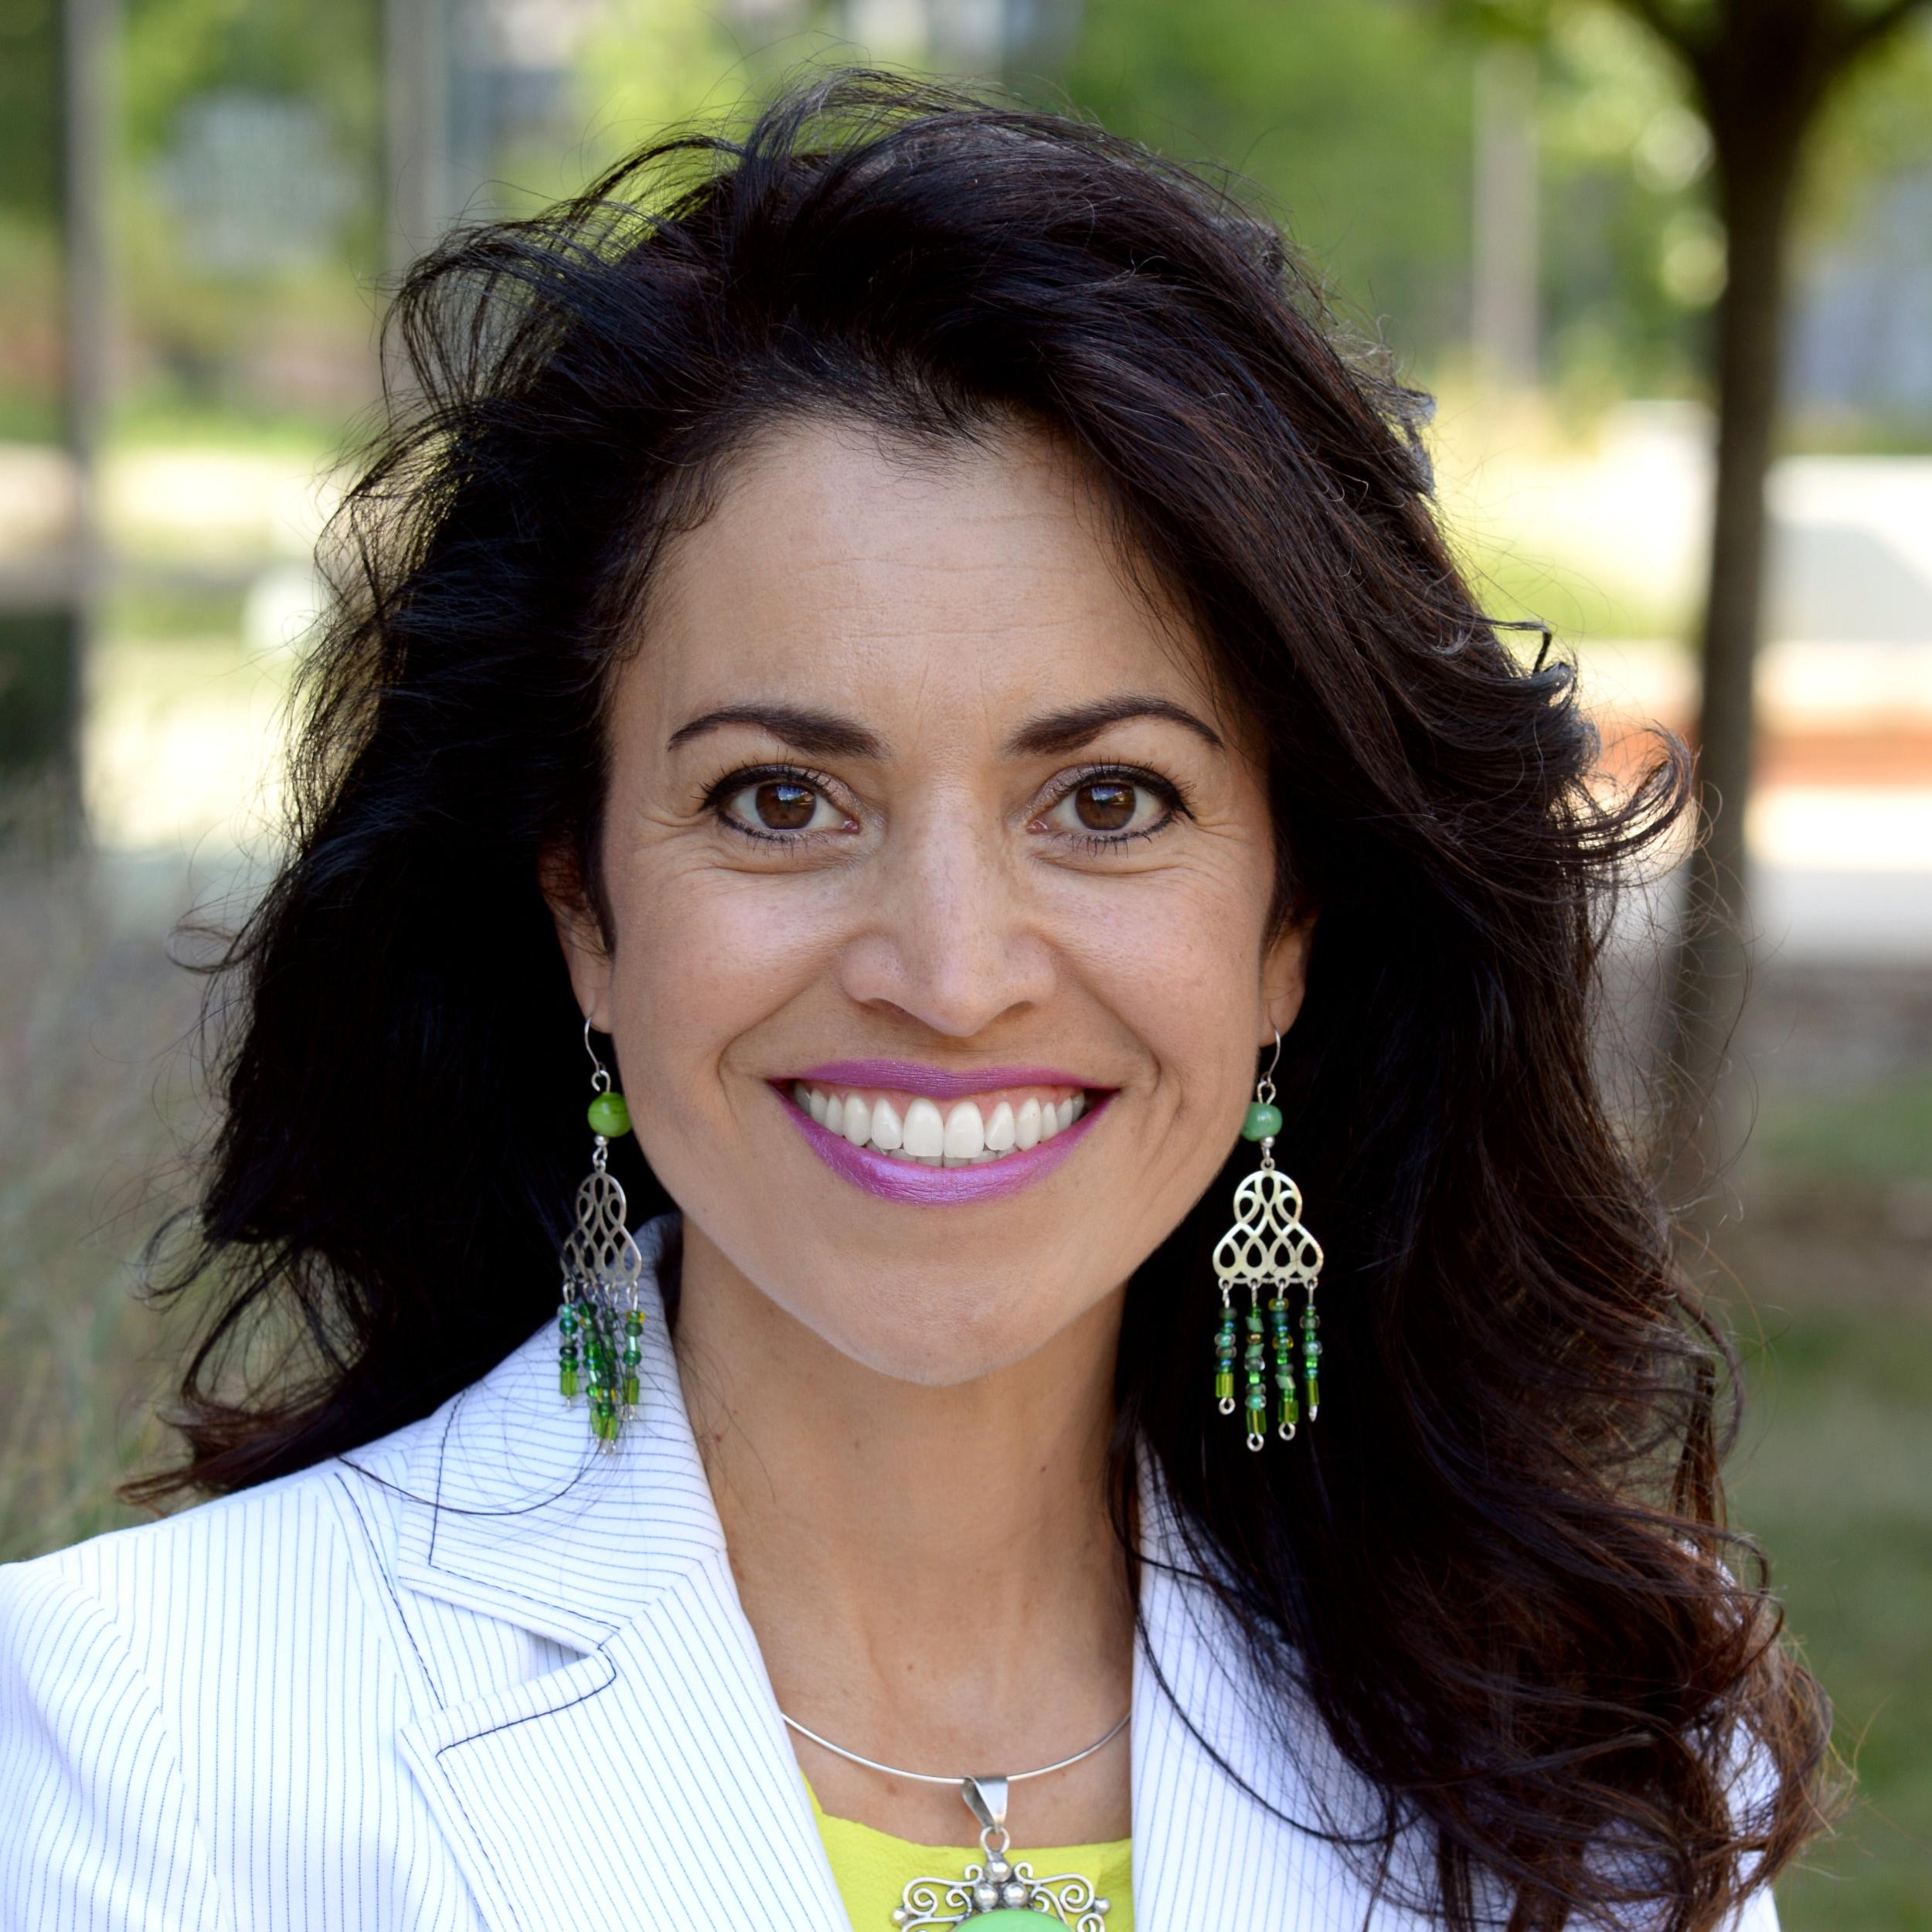 Dr. Rochelle Gutiérrez, Professor at University of Illinois Urbana-Champaign